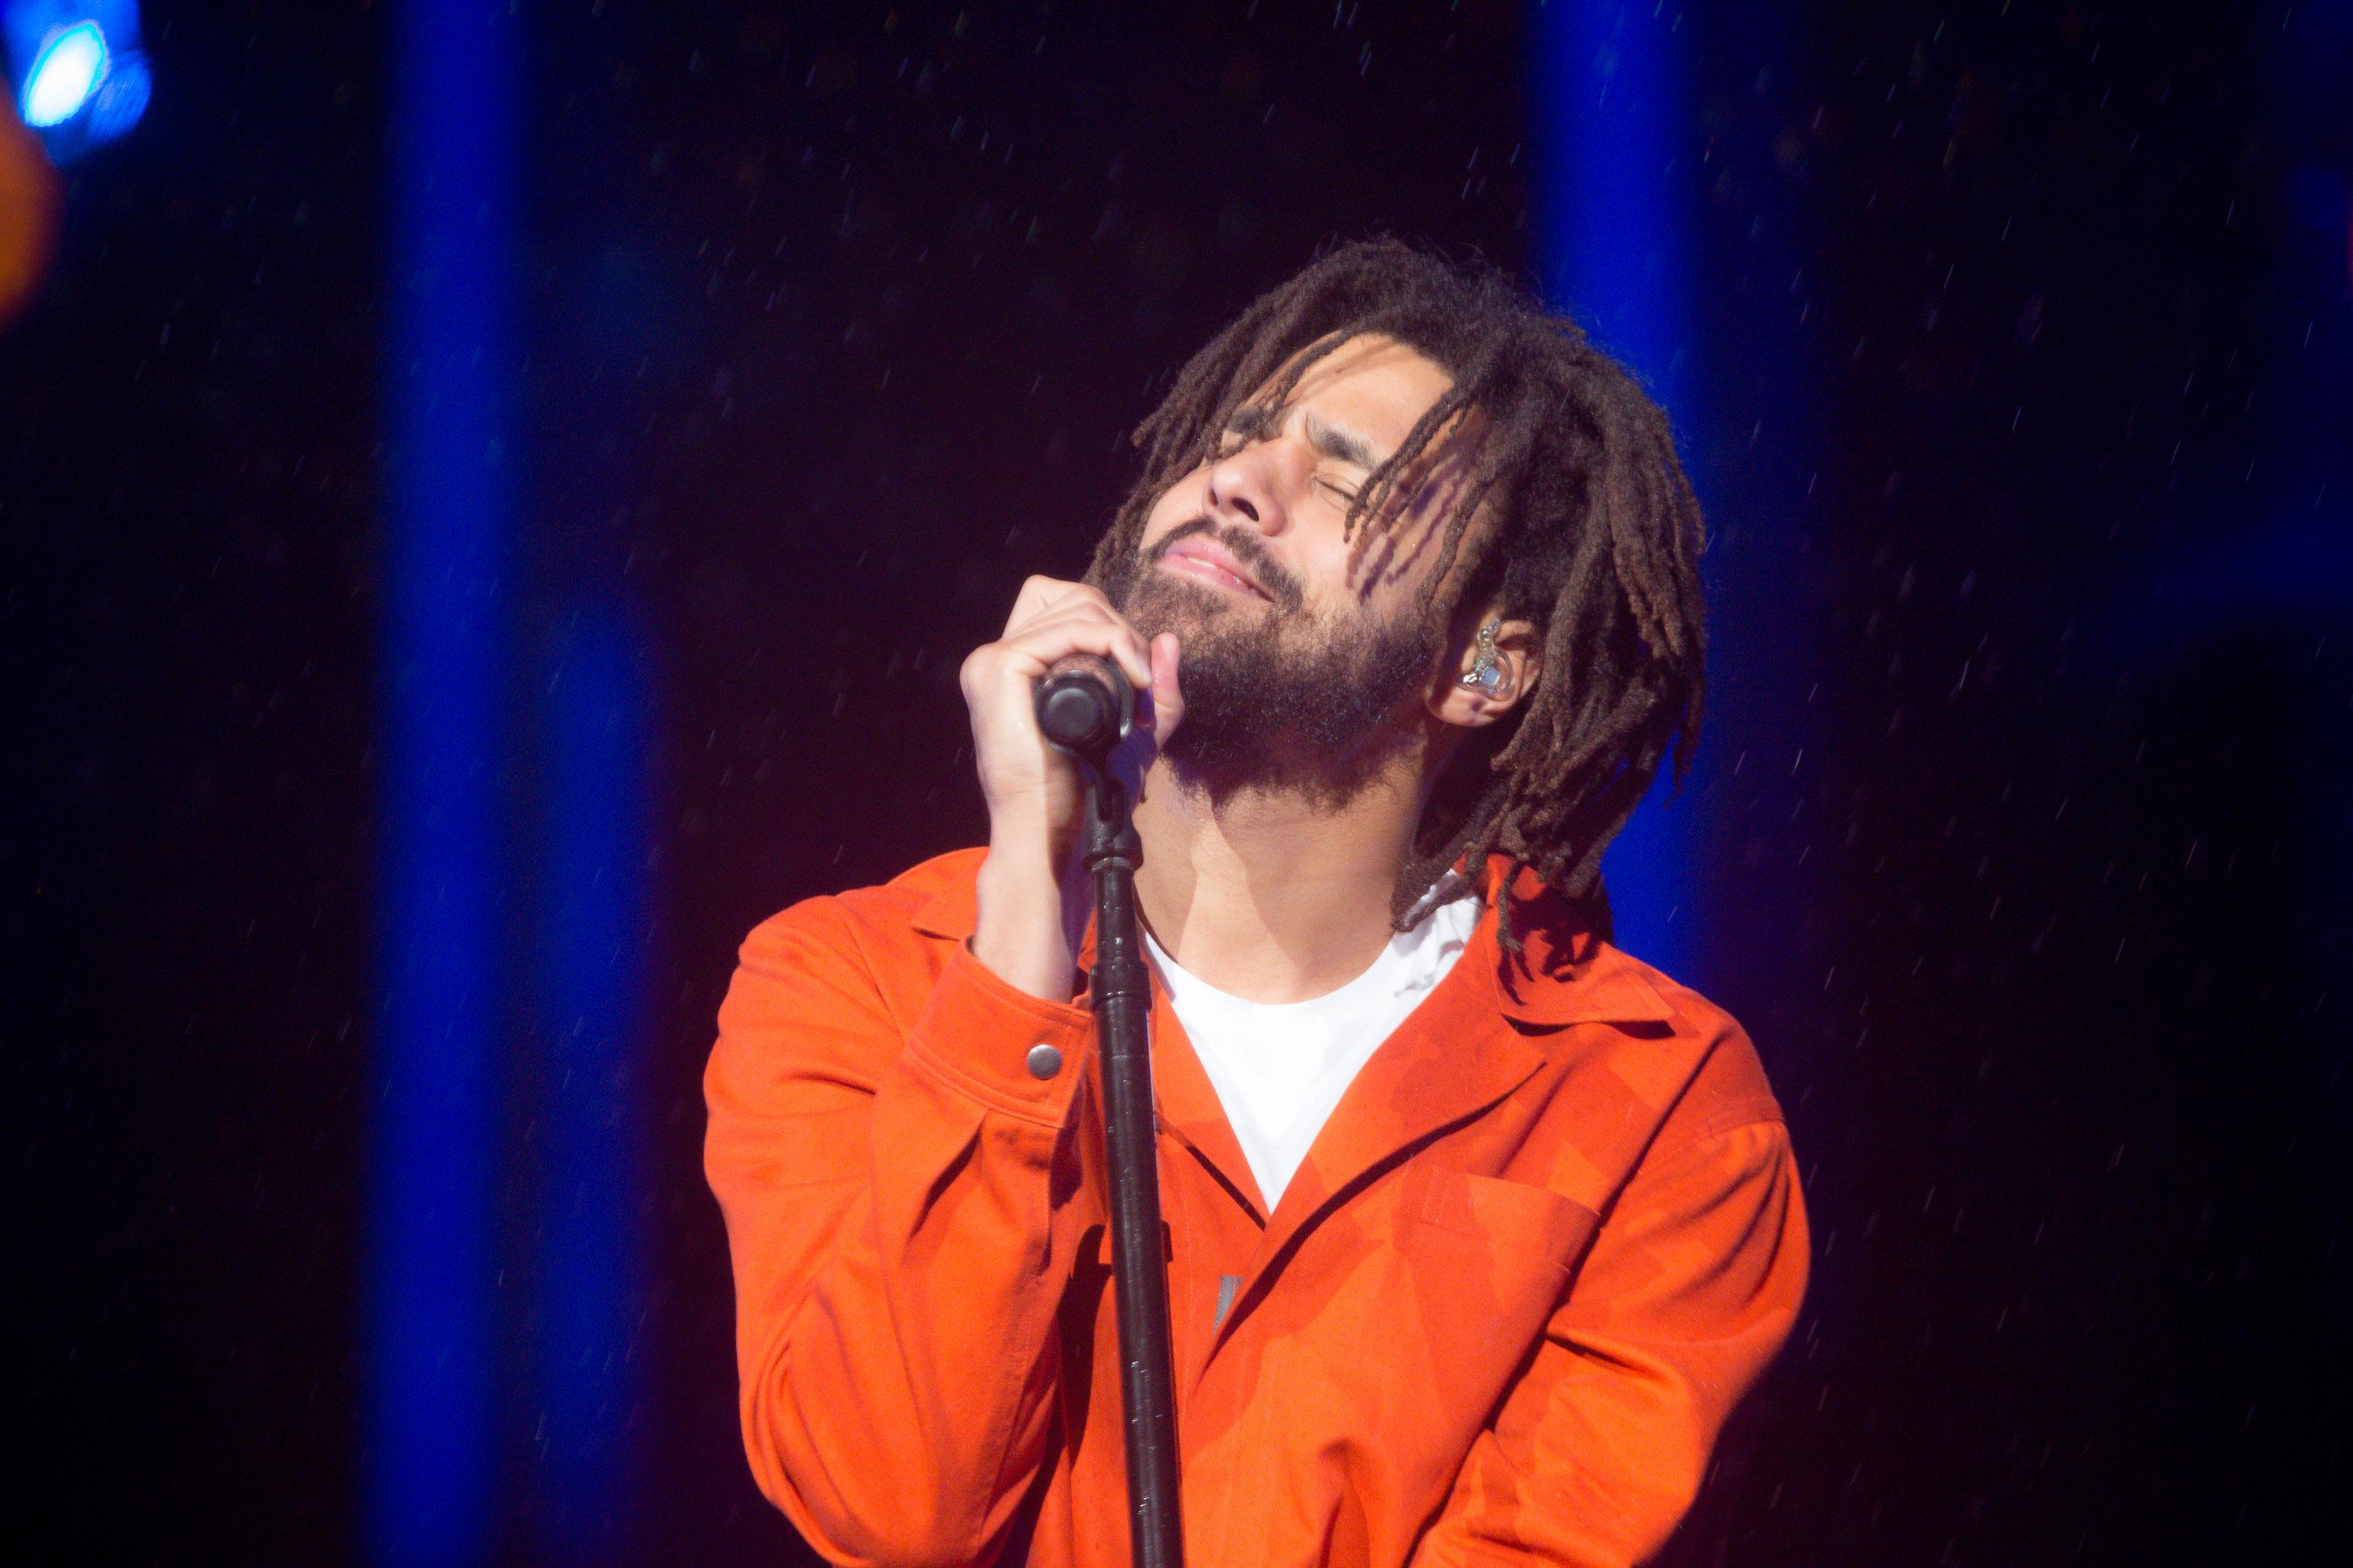 J. Cole Announces New Album 'The Off-Season'